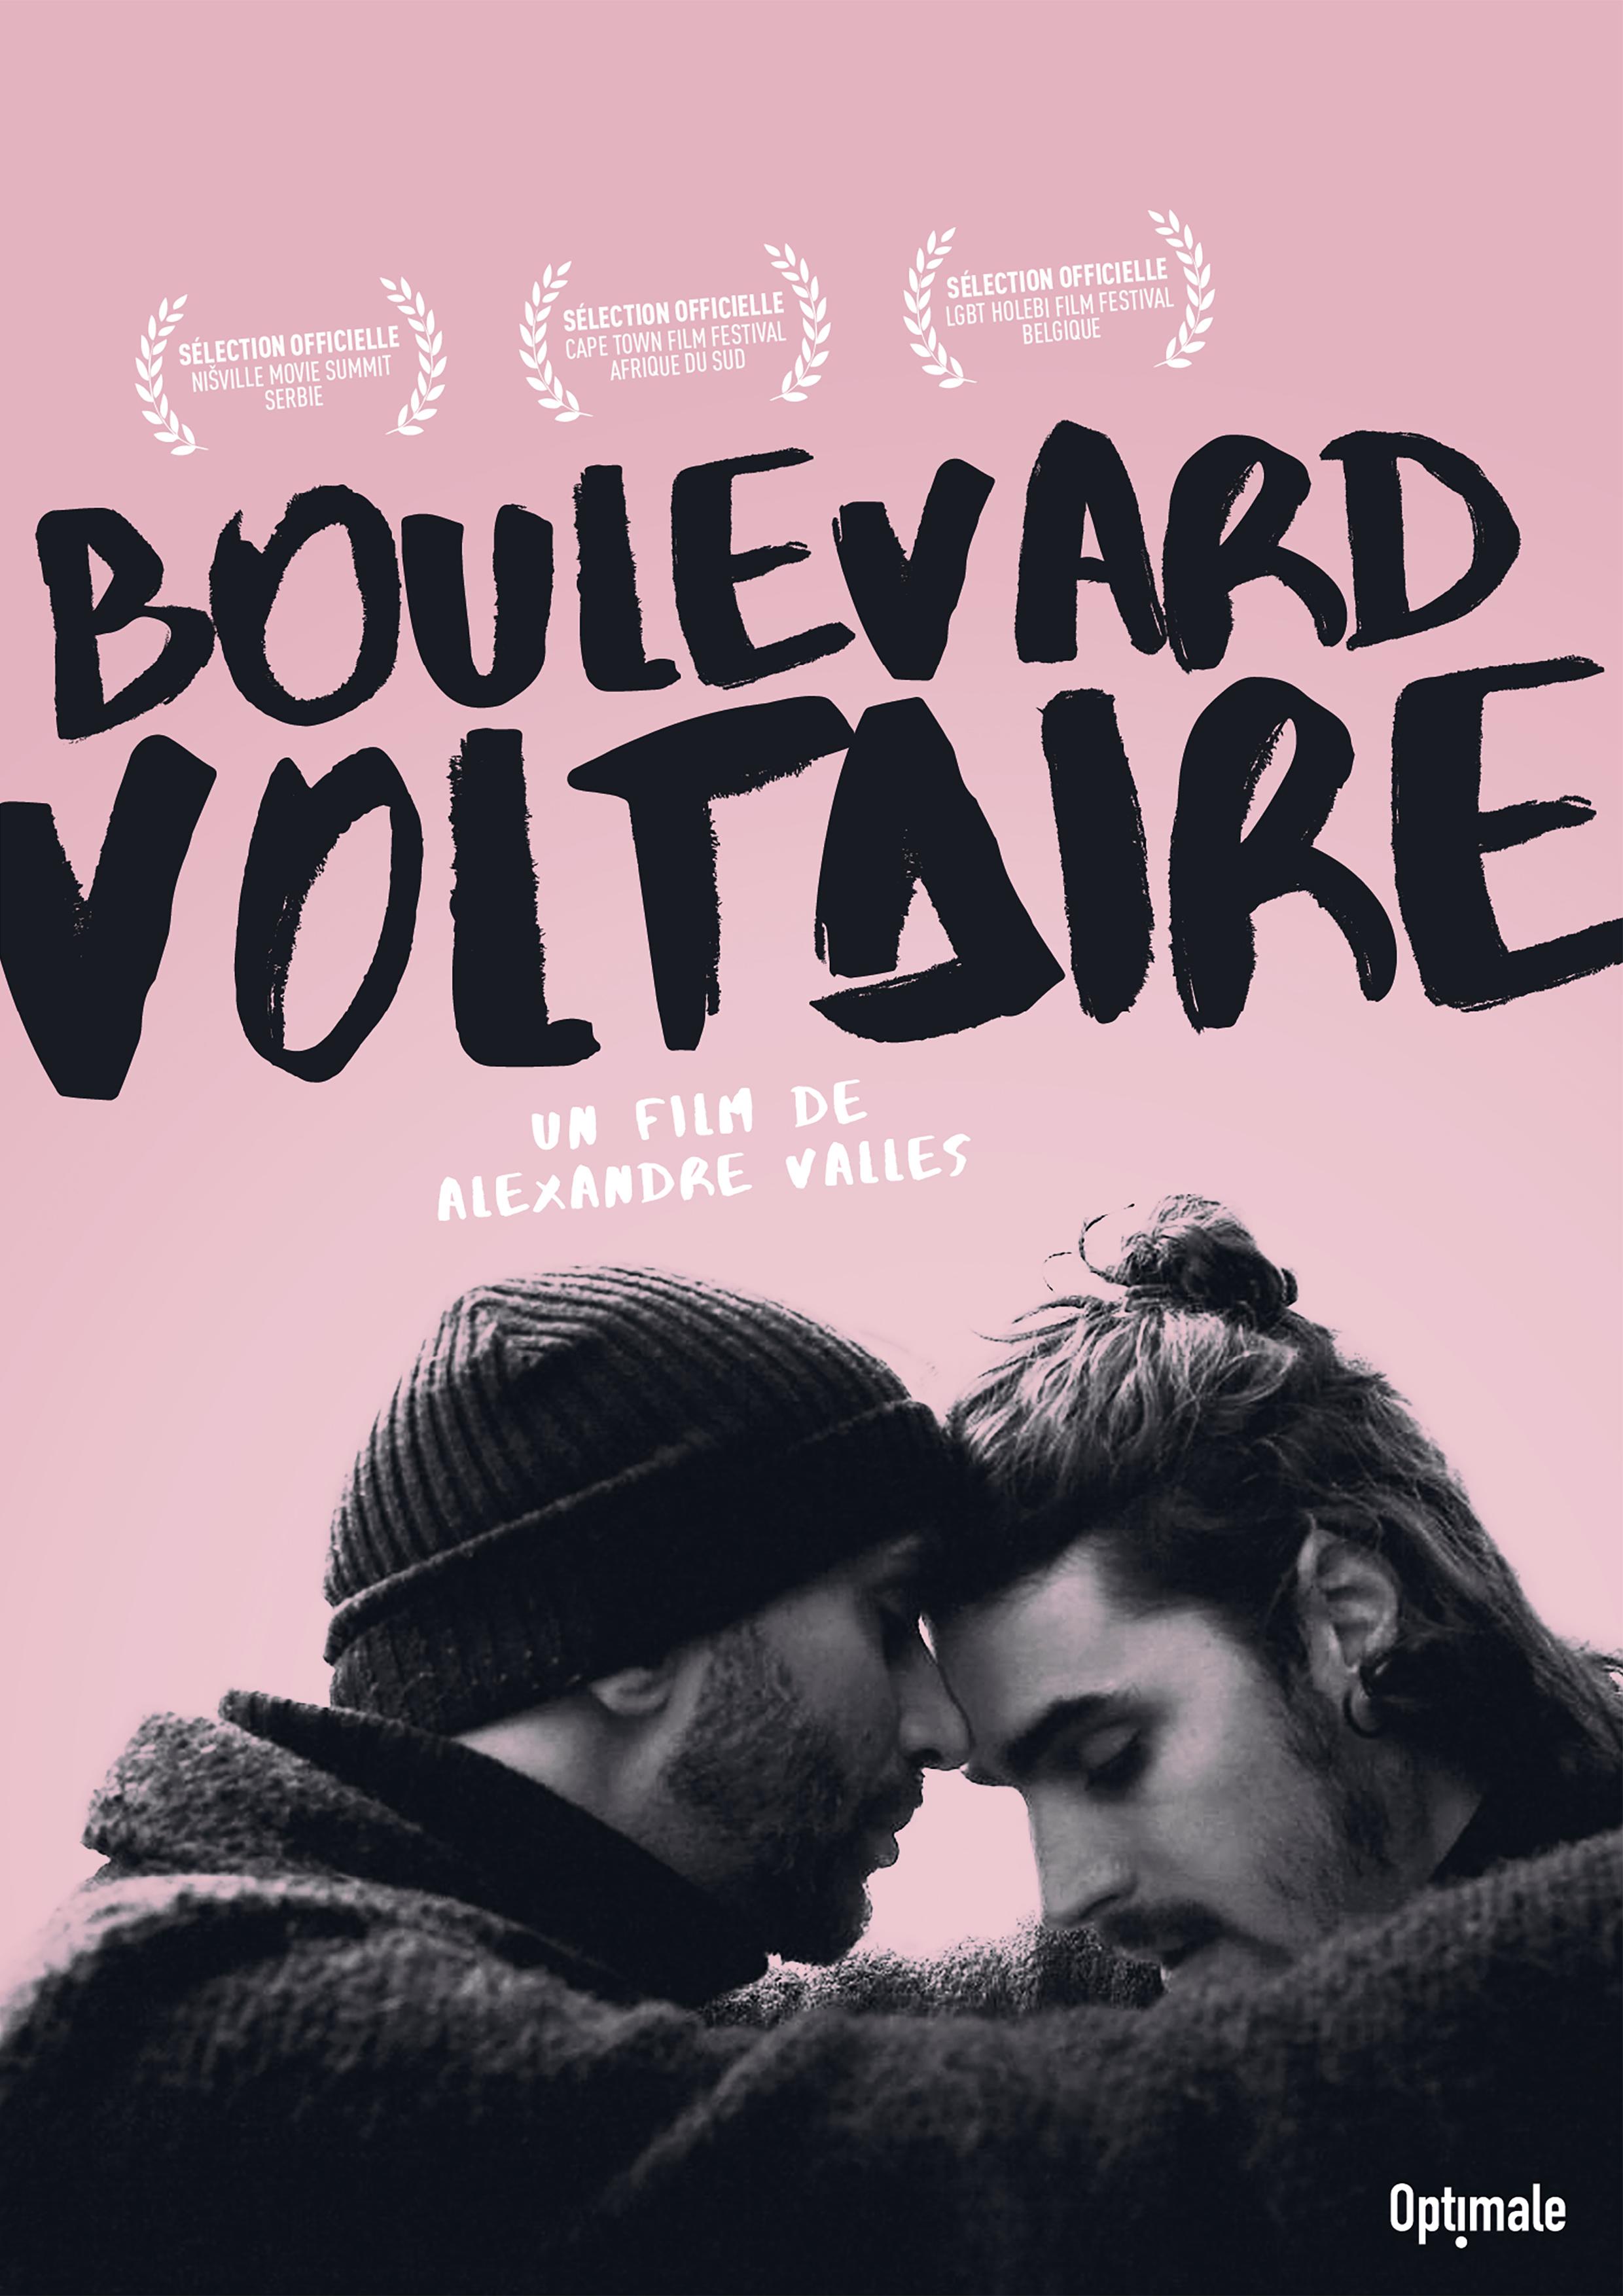 Voltaire Imdb 2018 >> Bd Voltaire 2017 Imdb